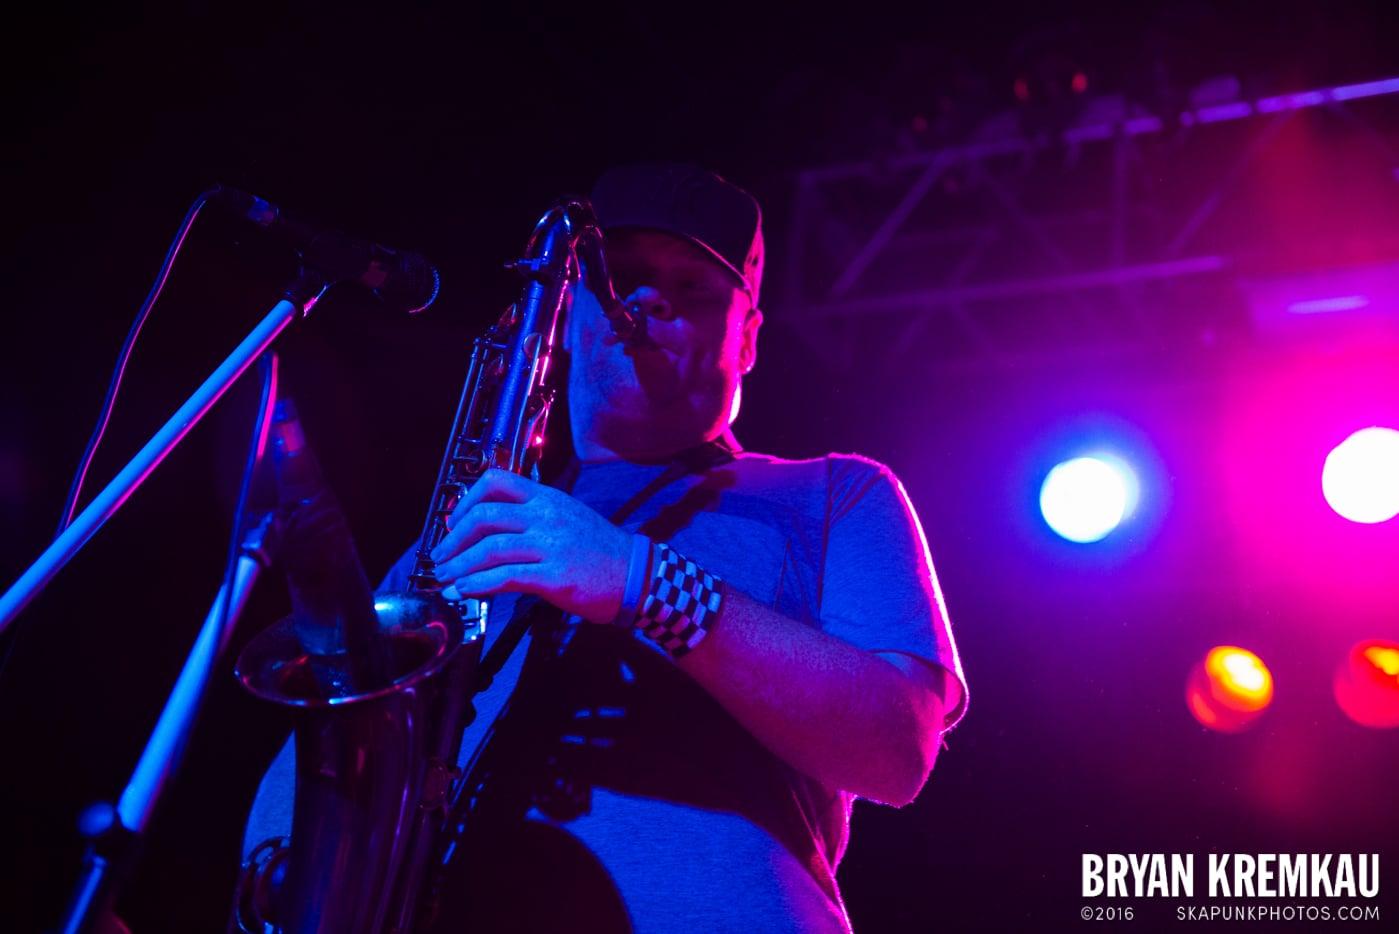 Less Than Jake @ Starland Ballroom, Sayreville, NJ - 11.9.13 (17)